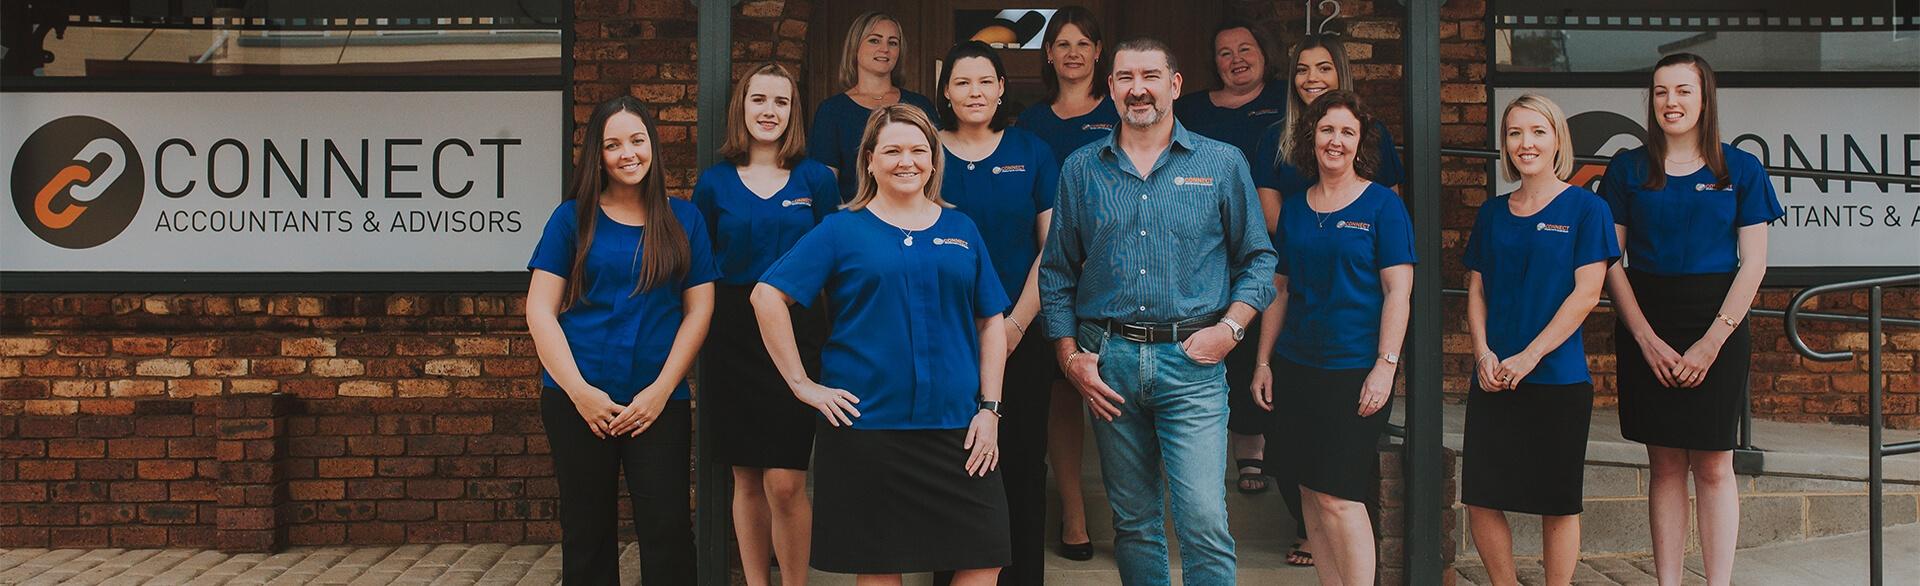 Connect Accountants & Advisors Team